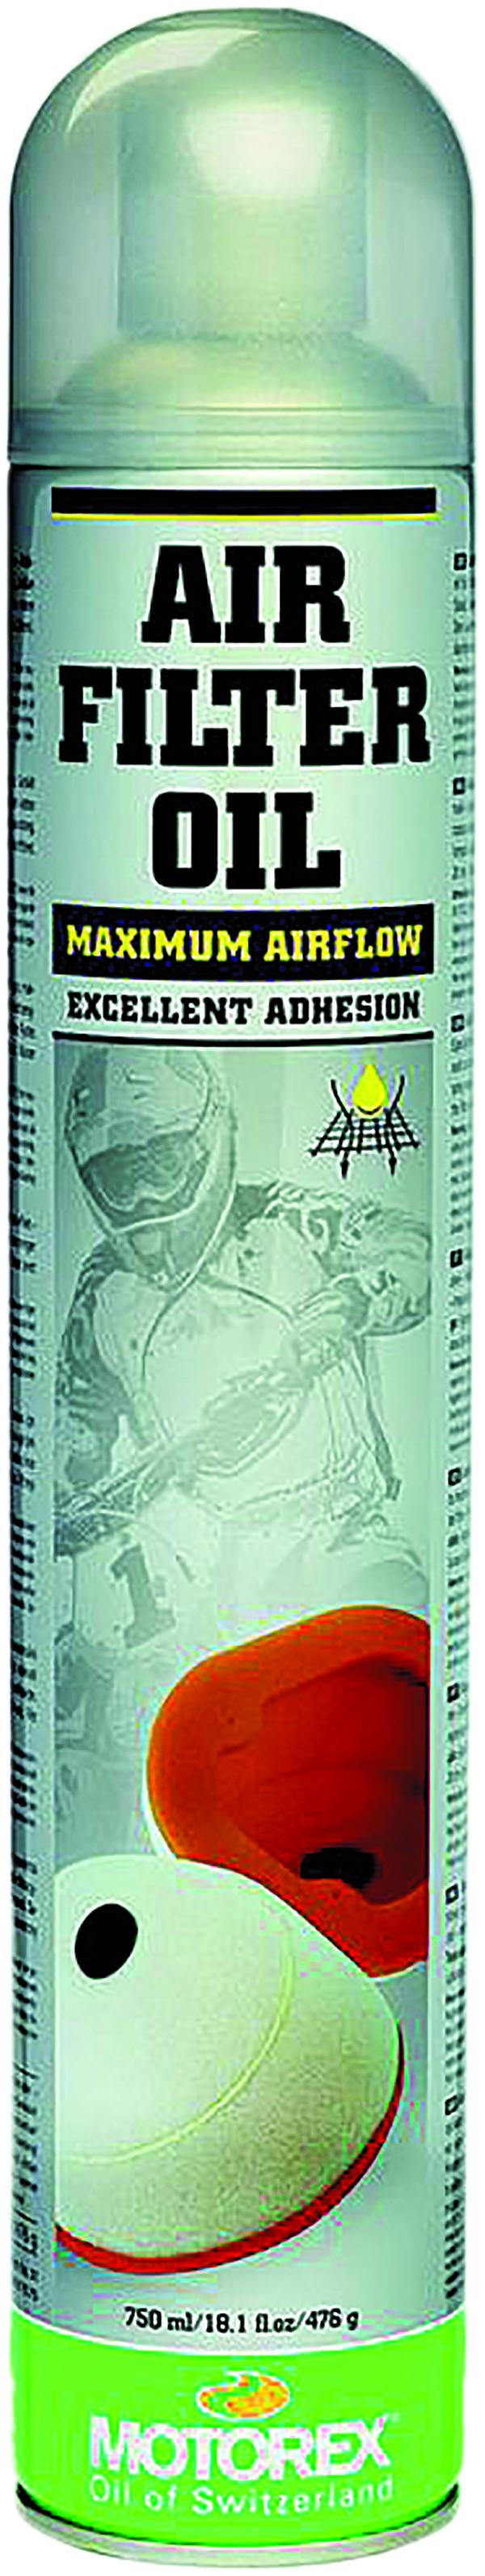 Air Filter Oil Spray 750Ml